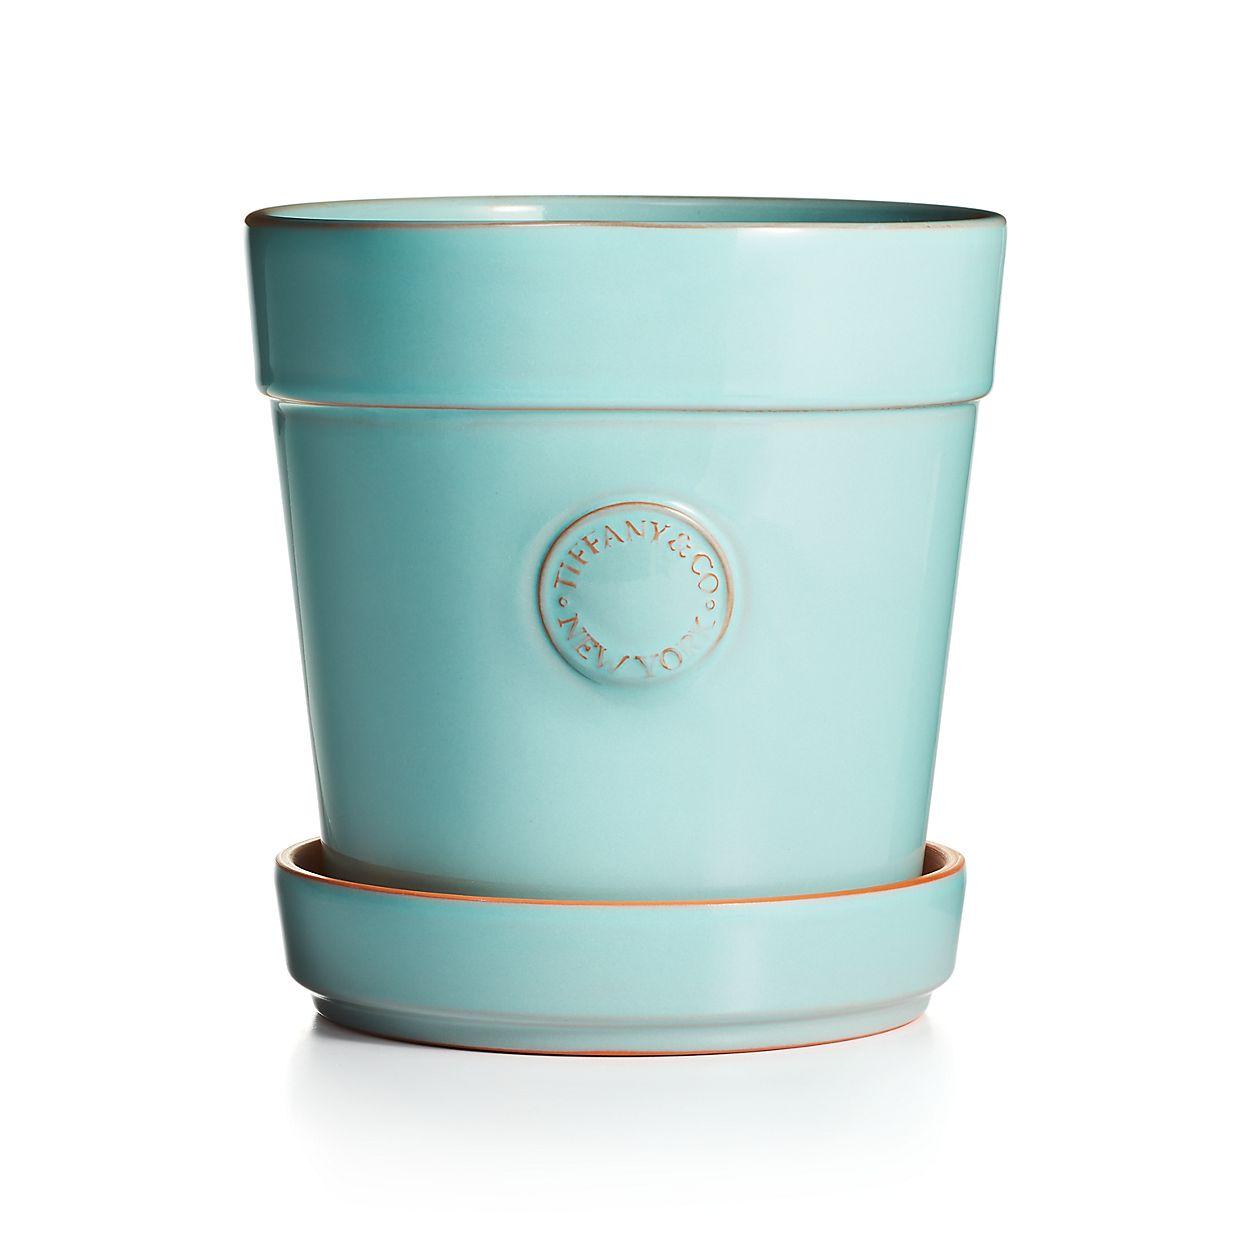 Everyday Objects Terra Cotta Flowerpot Tiffany Co